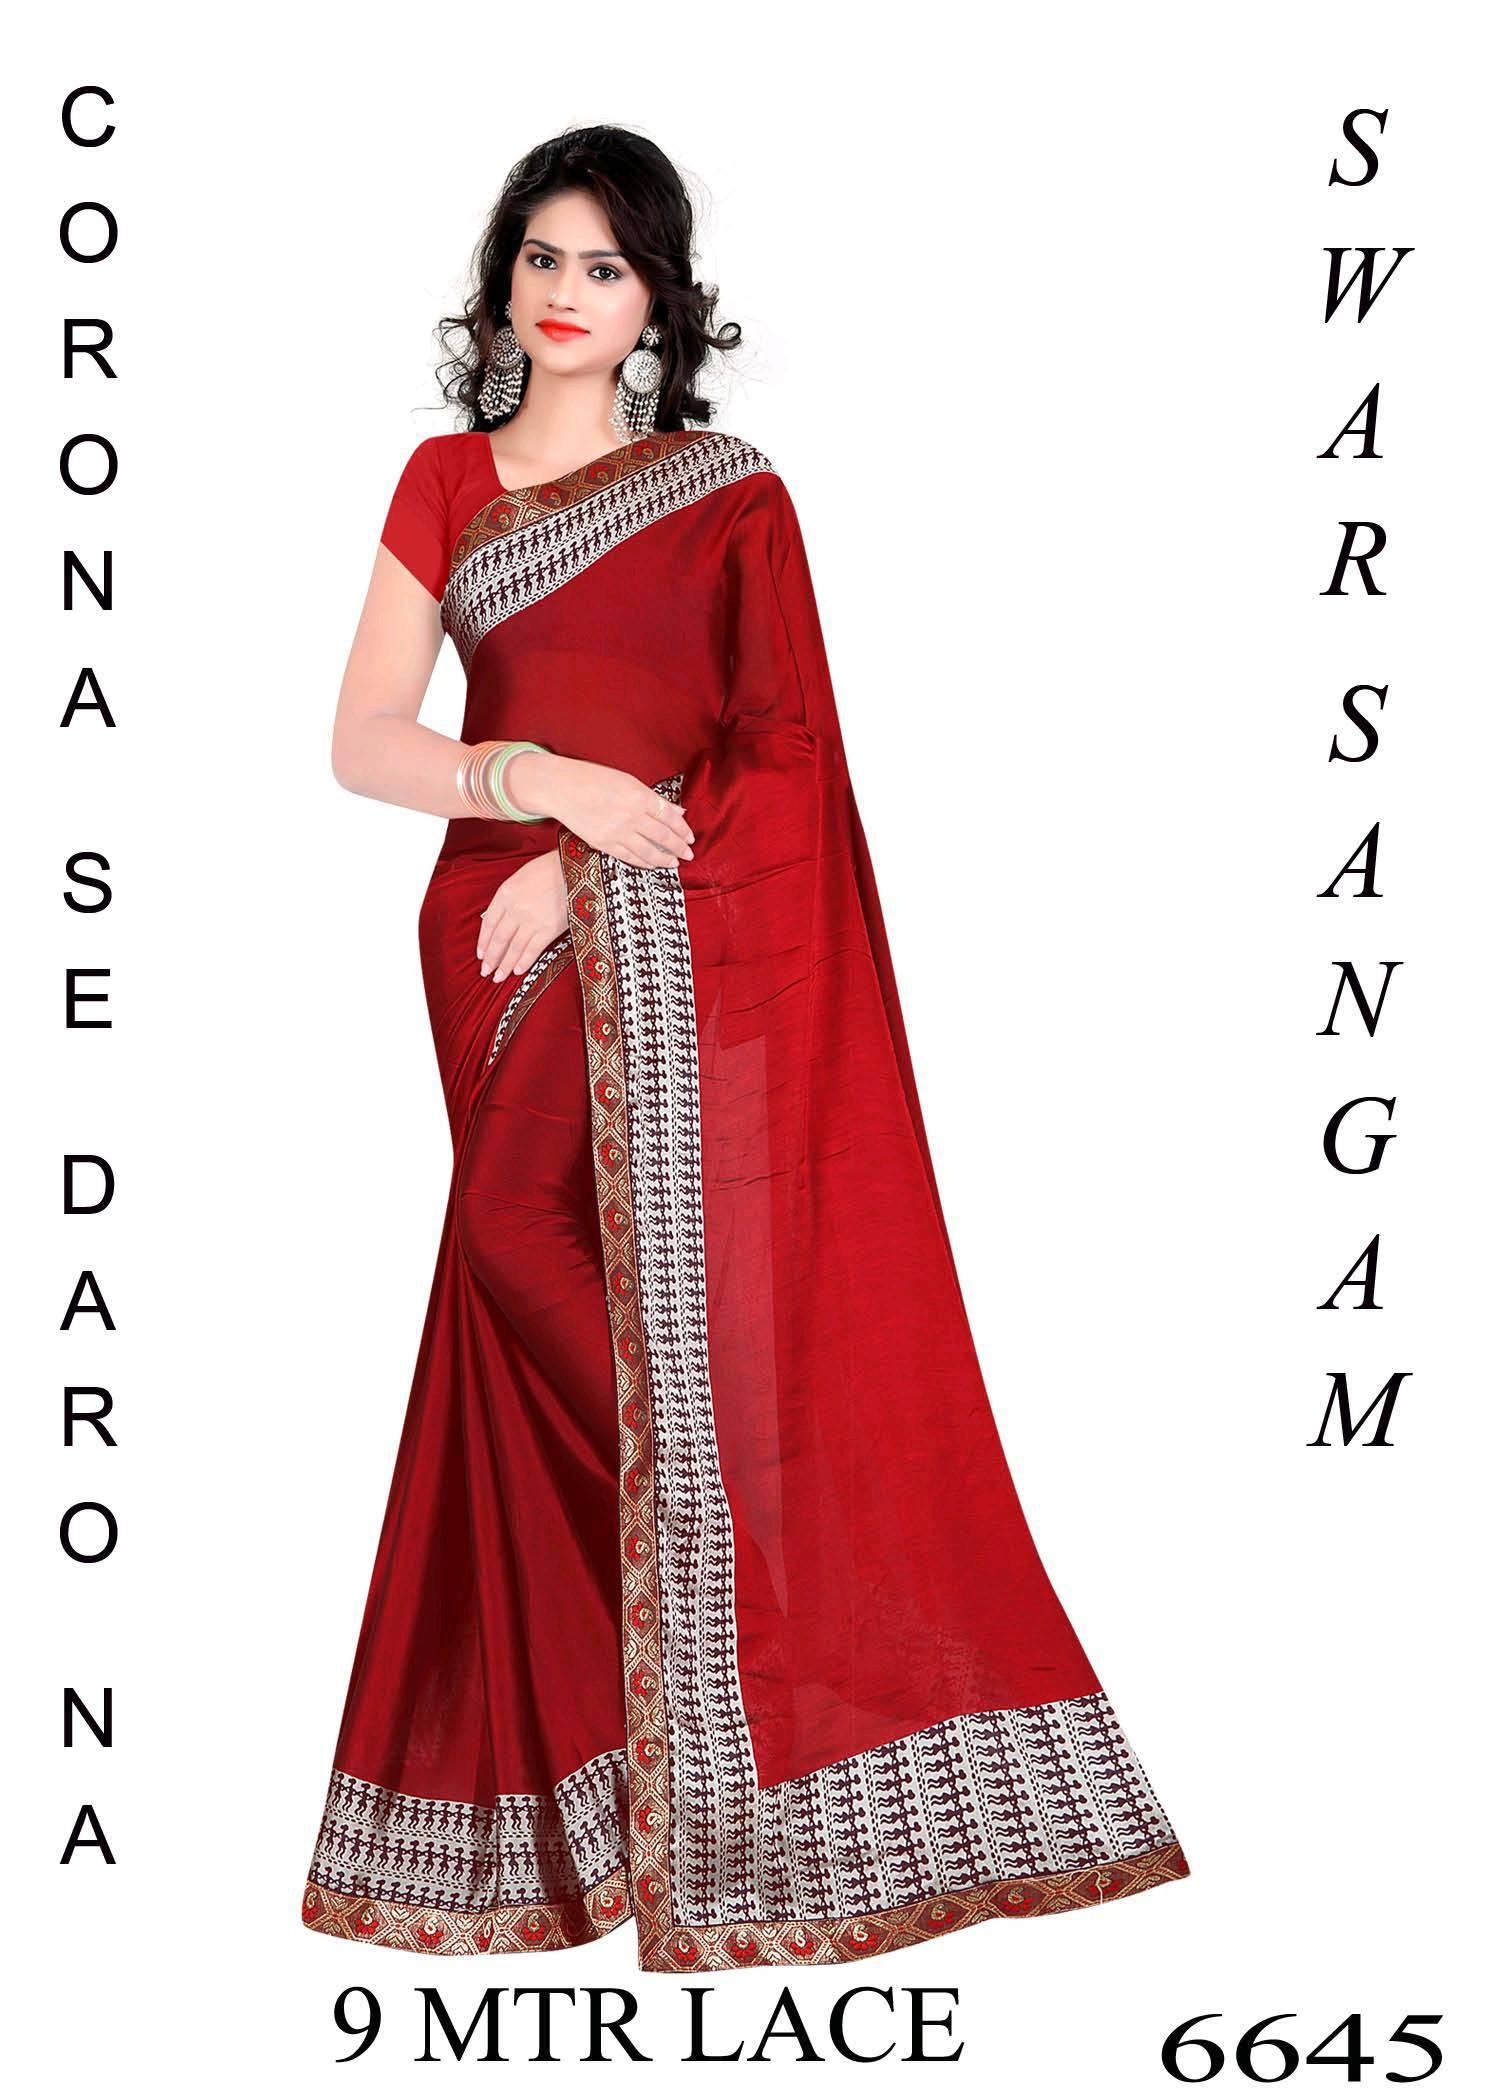 Latest Model Cheapest Printed Saree